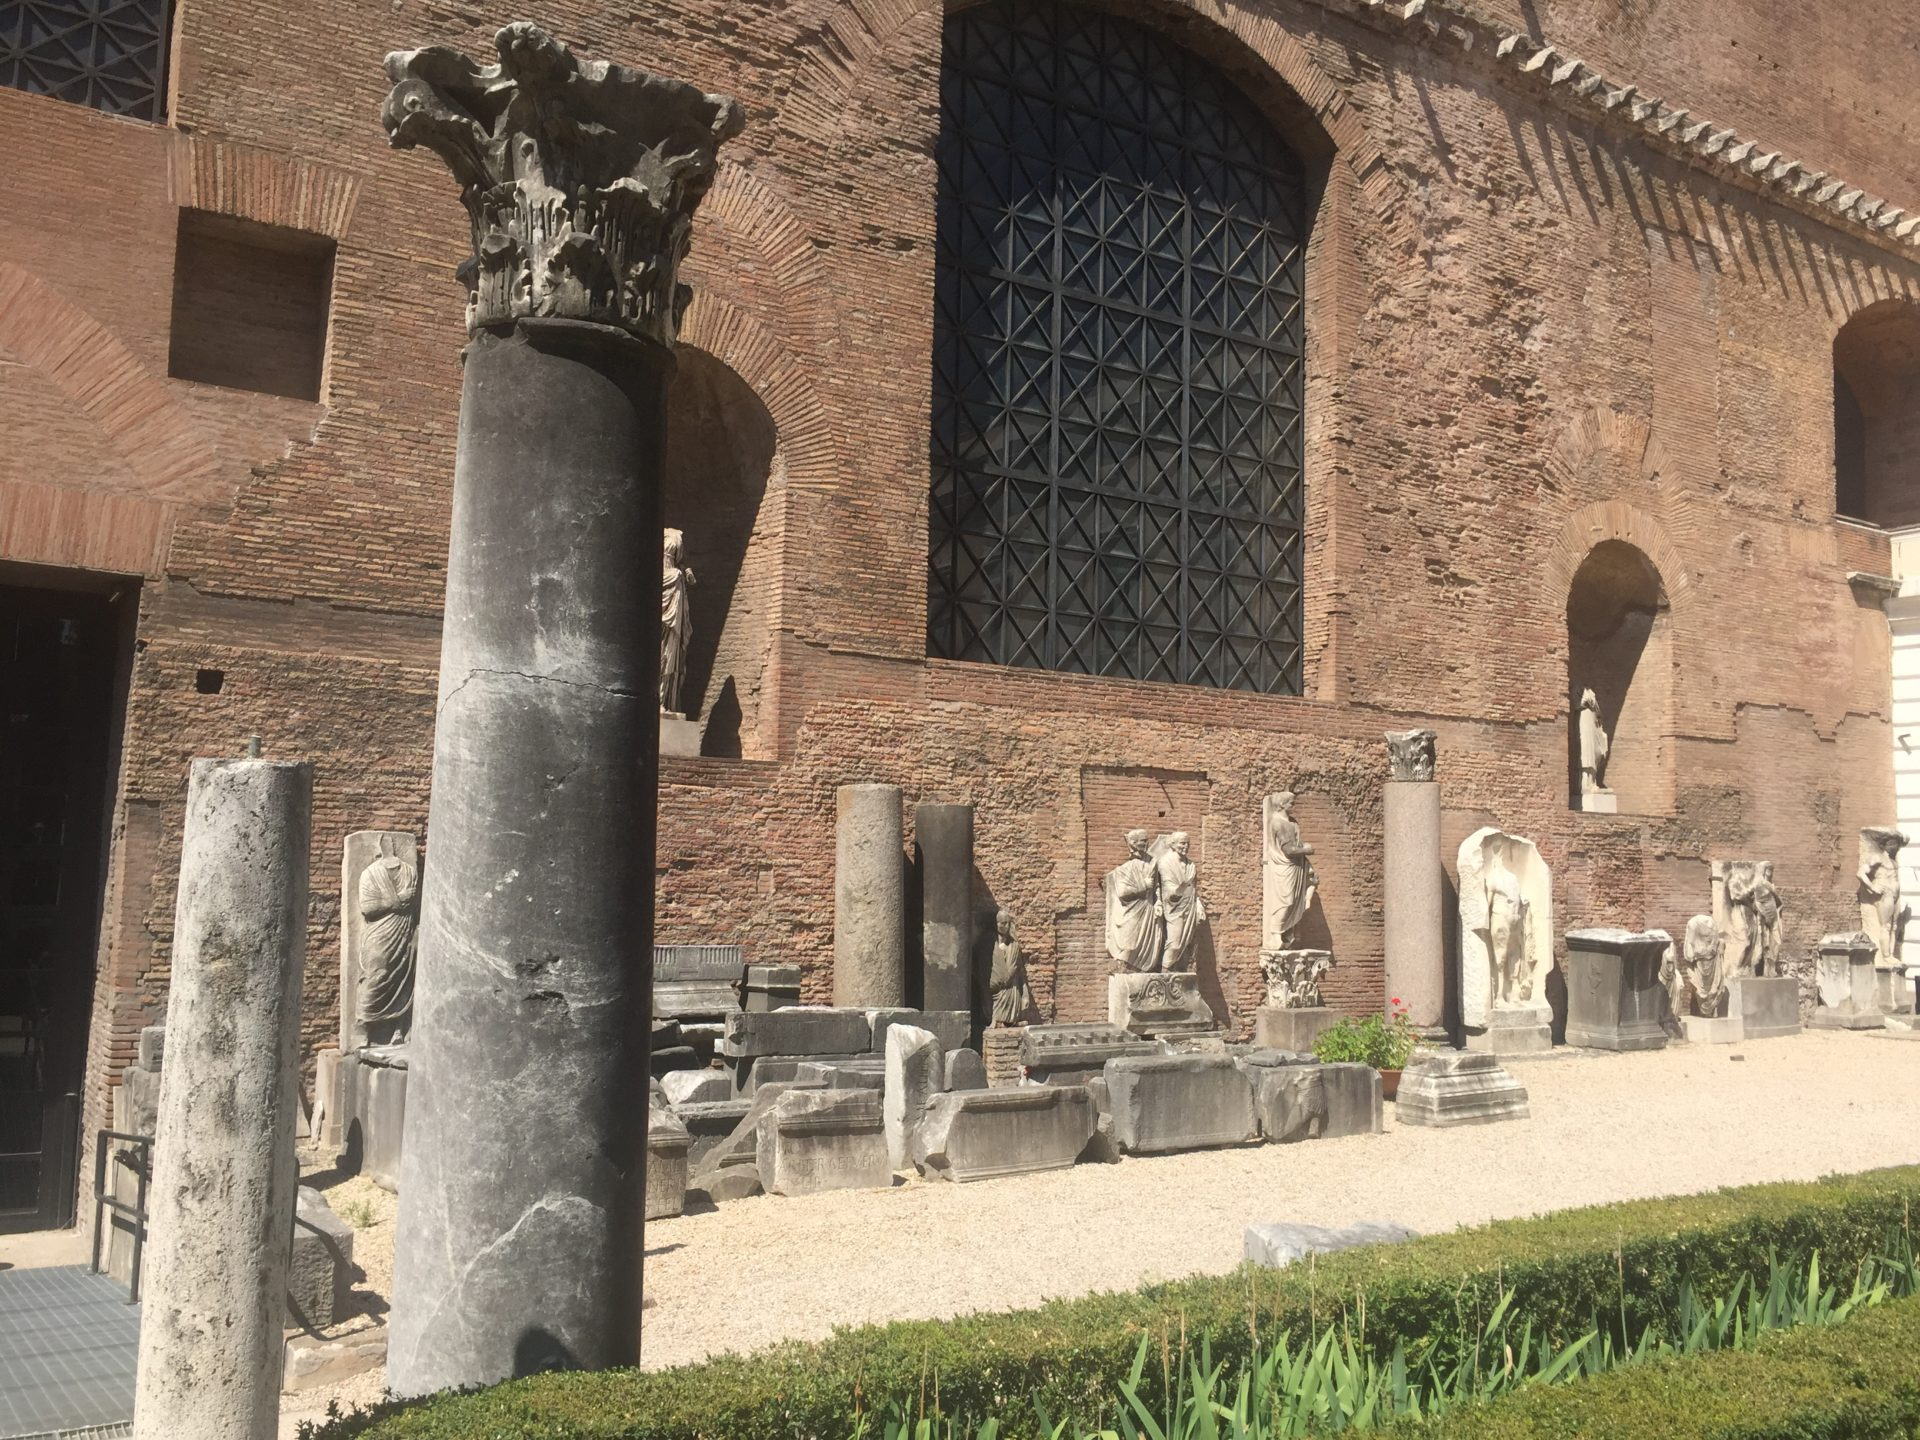 "<img src=""http://marenostrum.pl/wp-content/uploads//2019/11/museo-nazionale-romano.jpeg"" alt=""museo nazionale romano""/>"